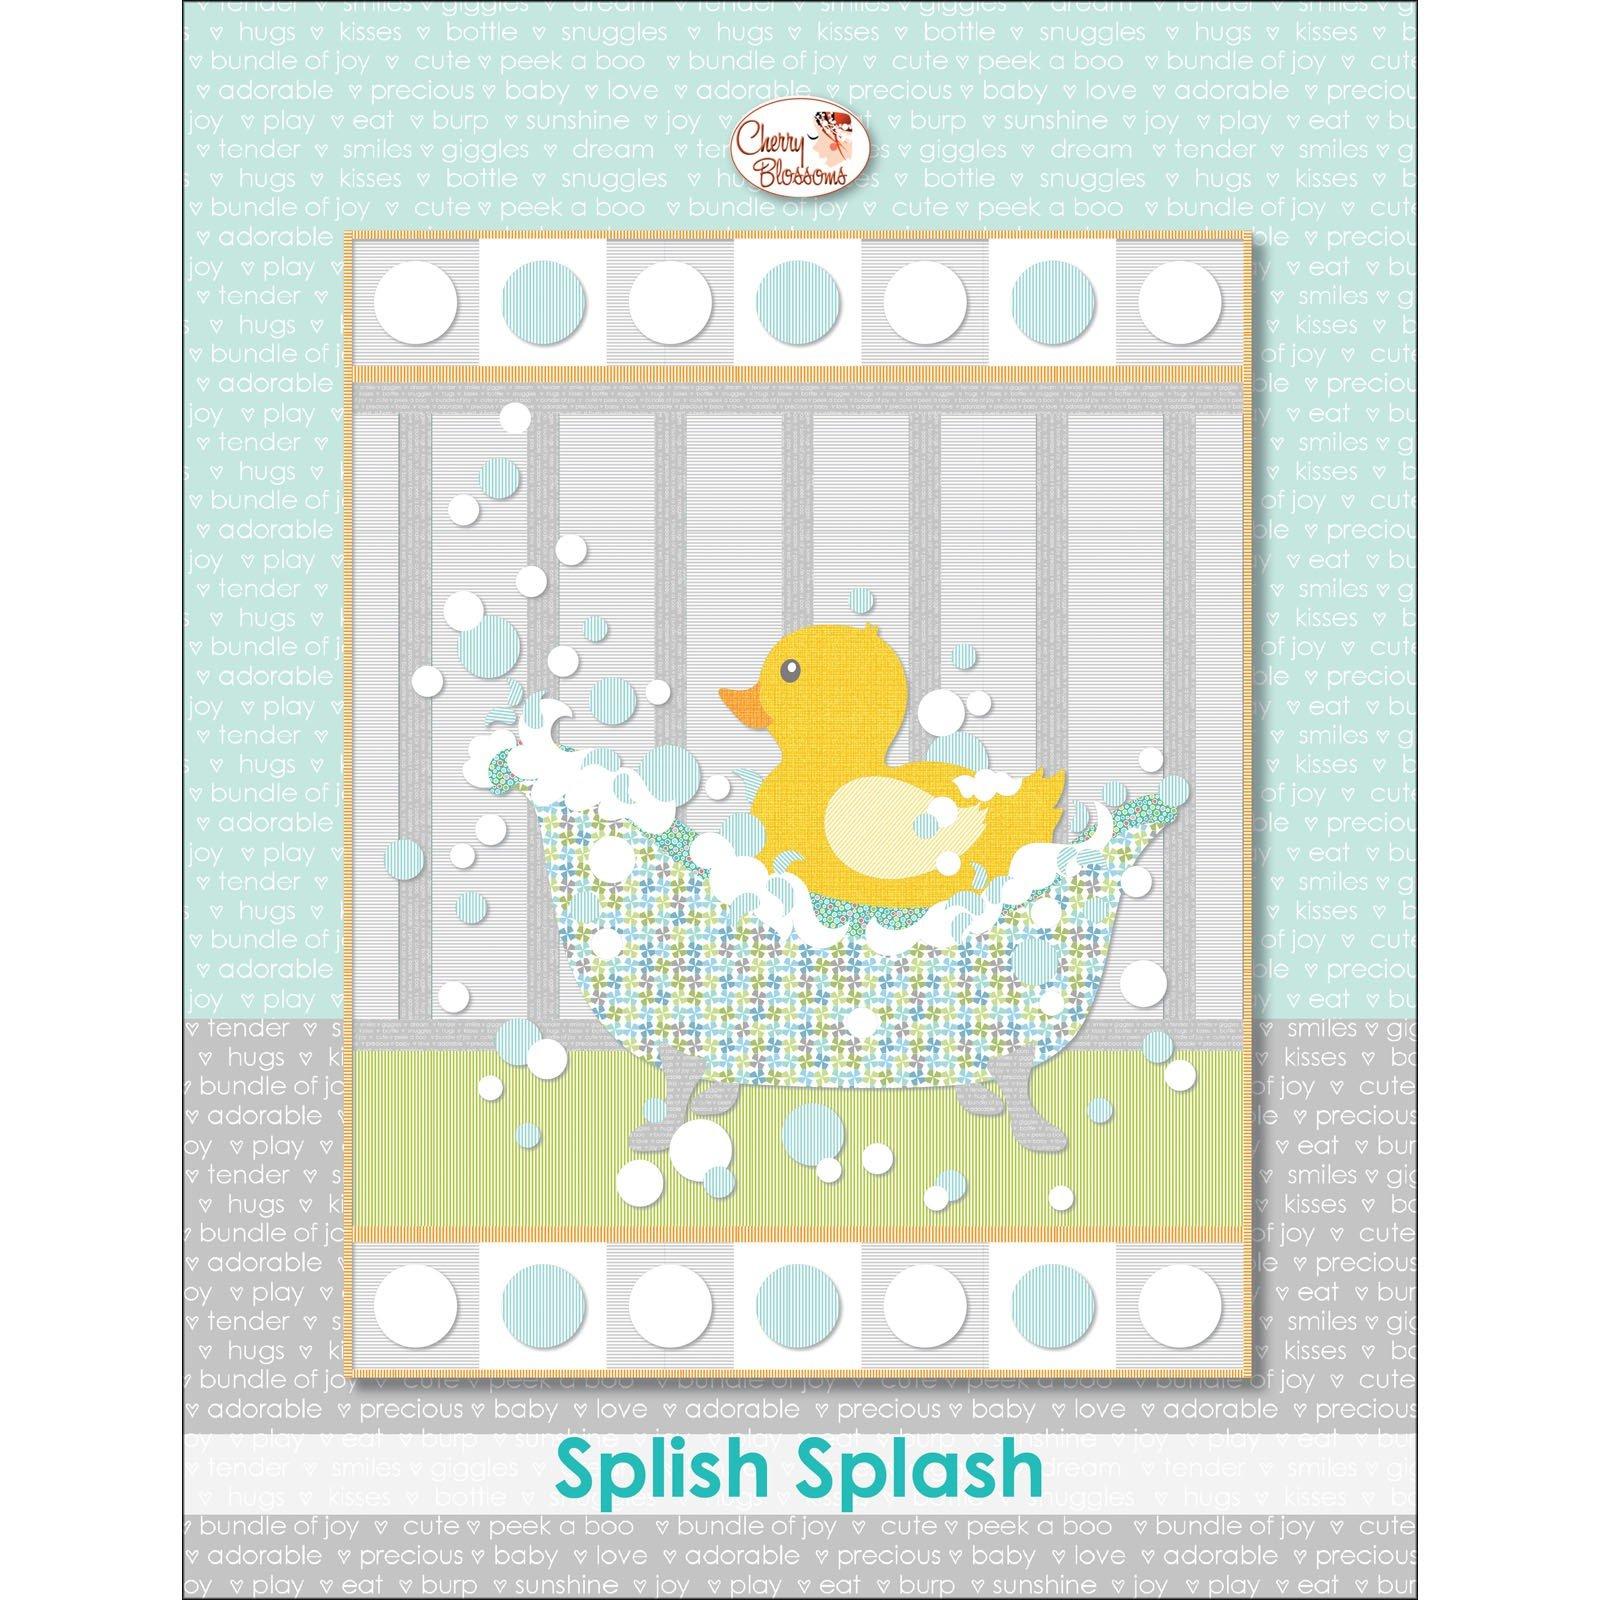 Cherry Blossoms Quilting Studio - Splish Splash